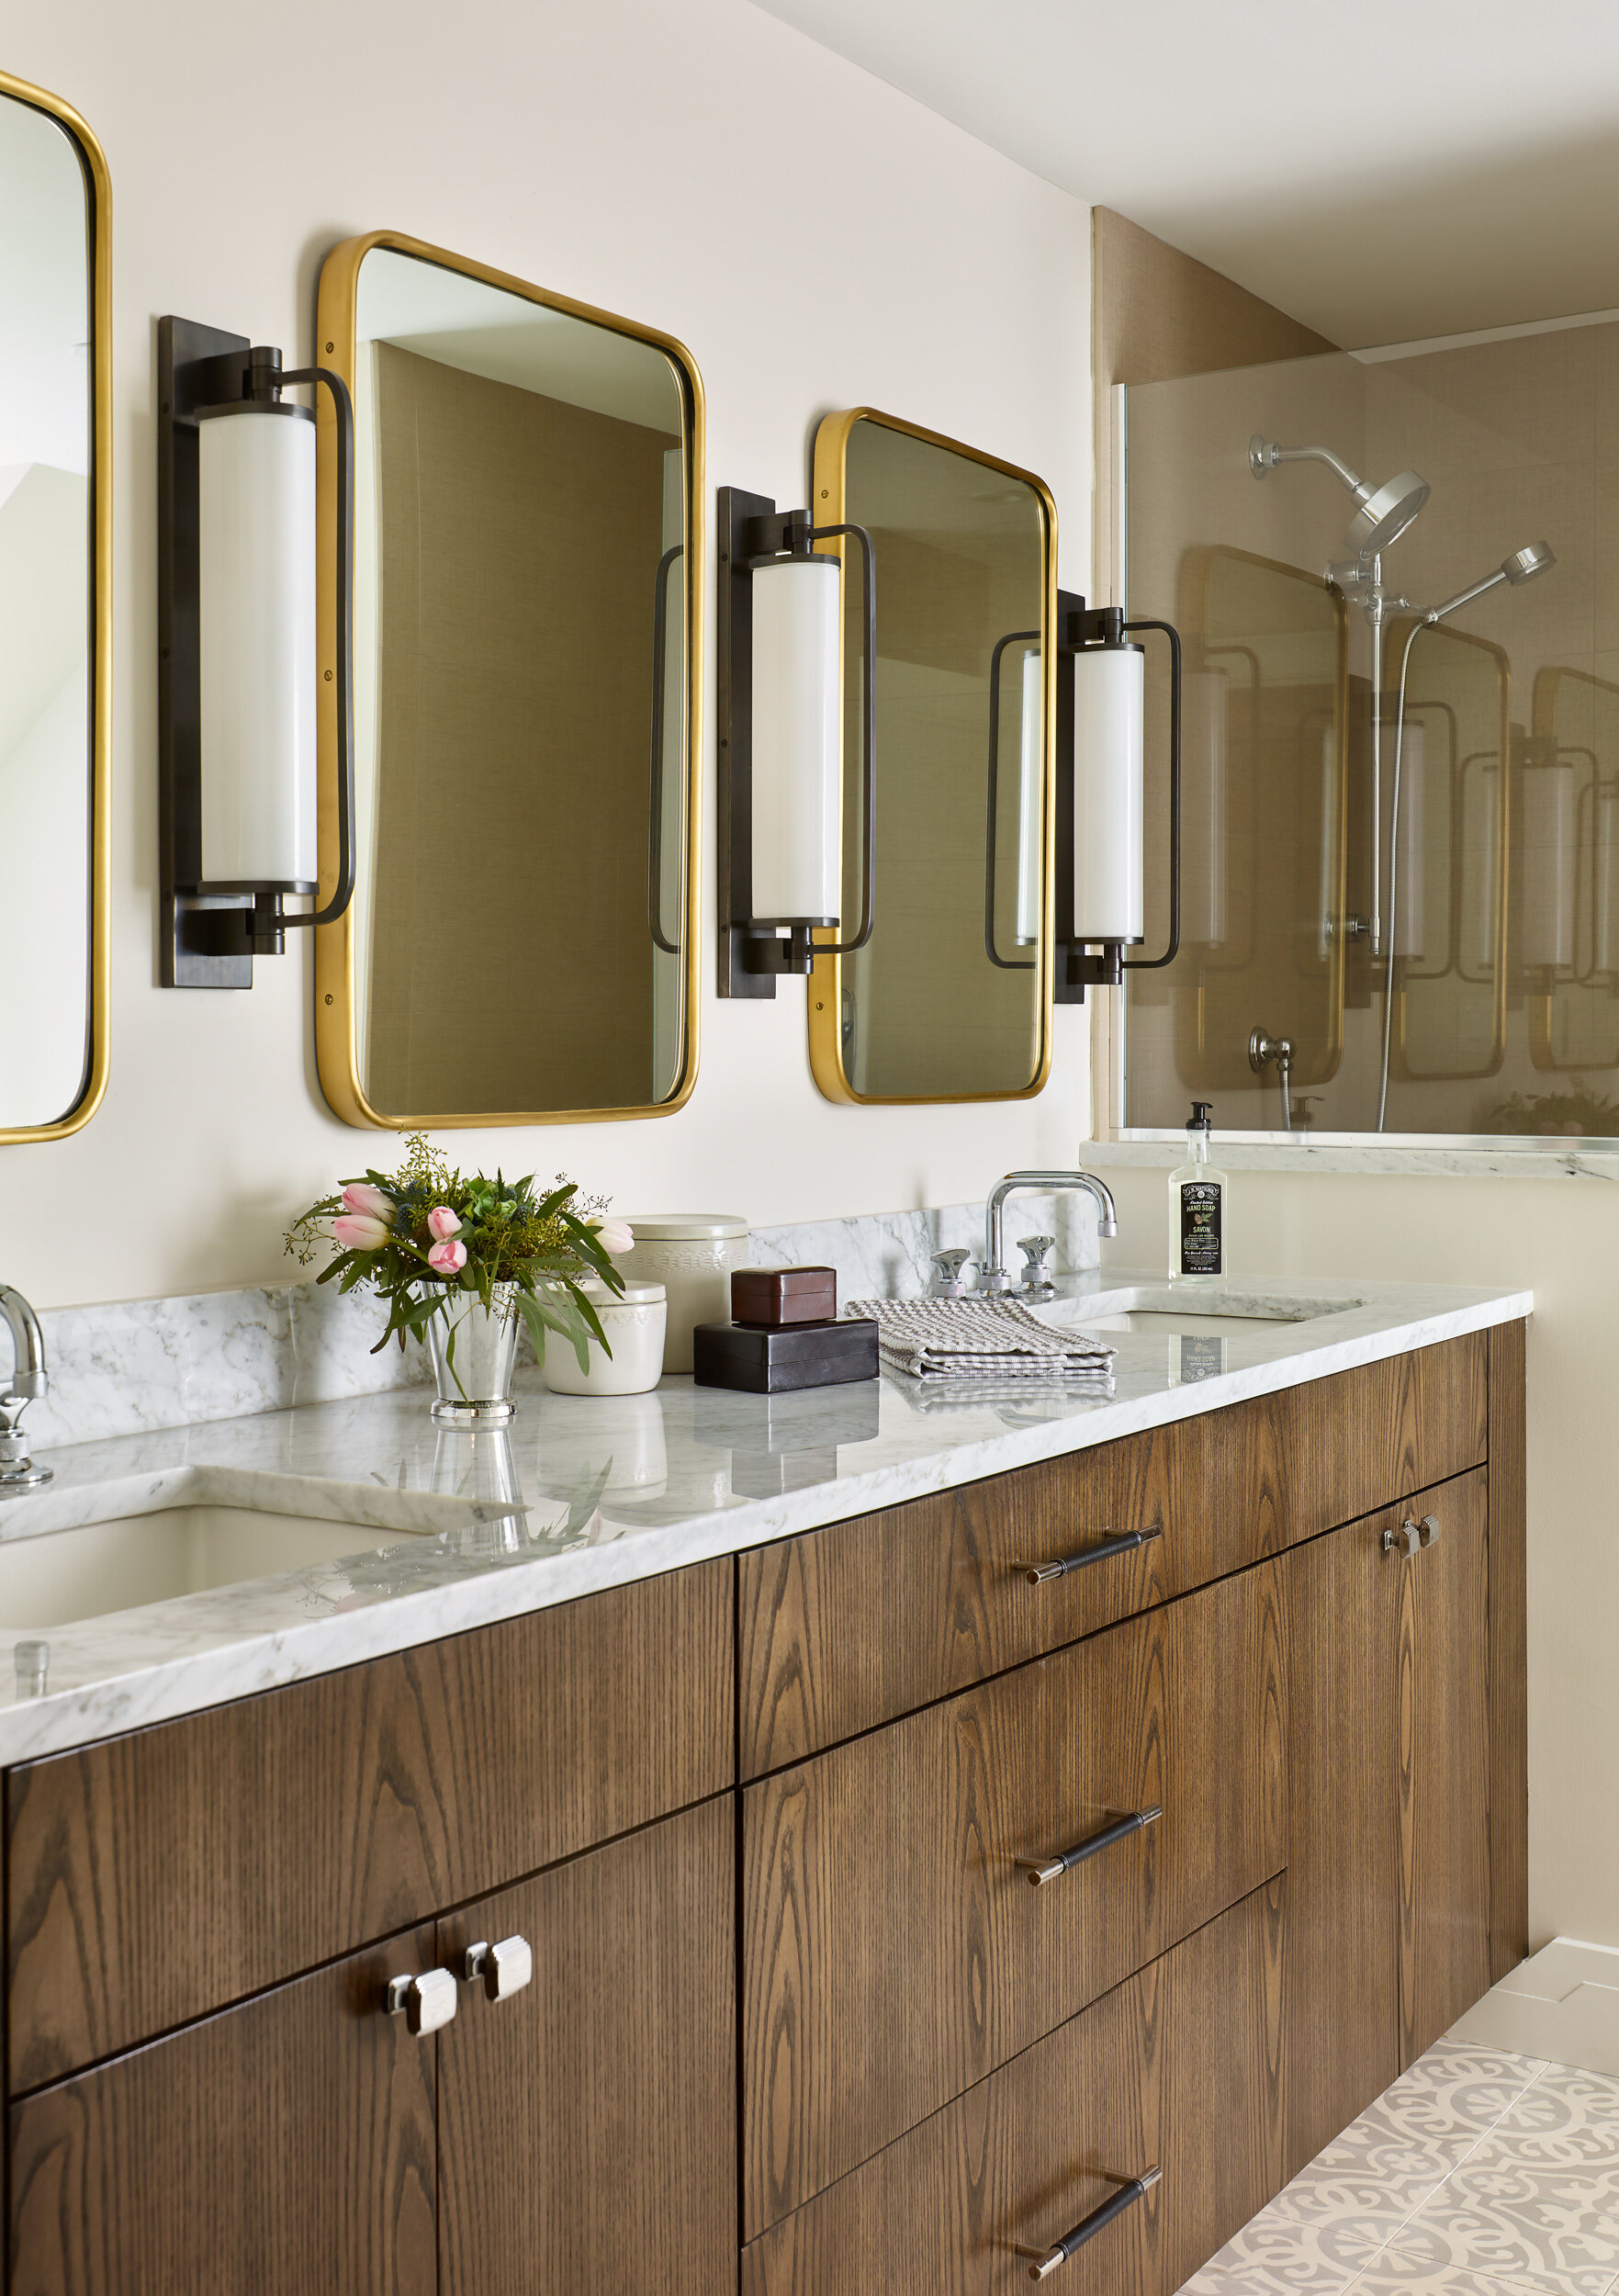 mackenzie-and-company-boston-westwood-interior-design-master-bathroom-style-3